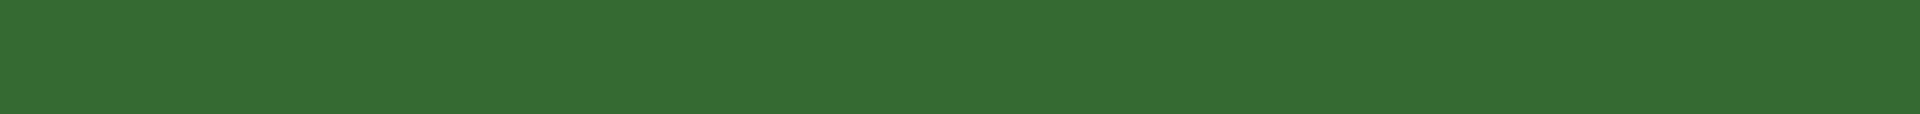 fascia-verde-bottom